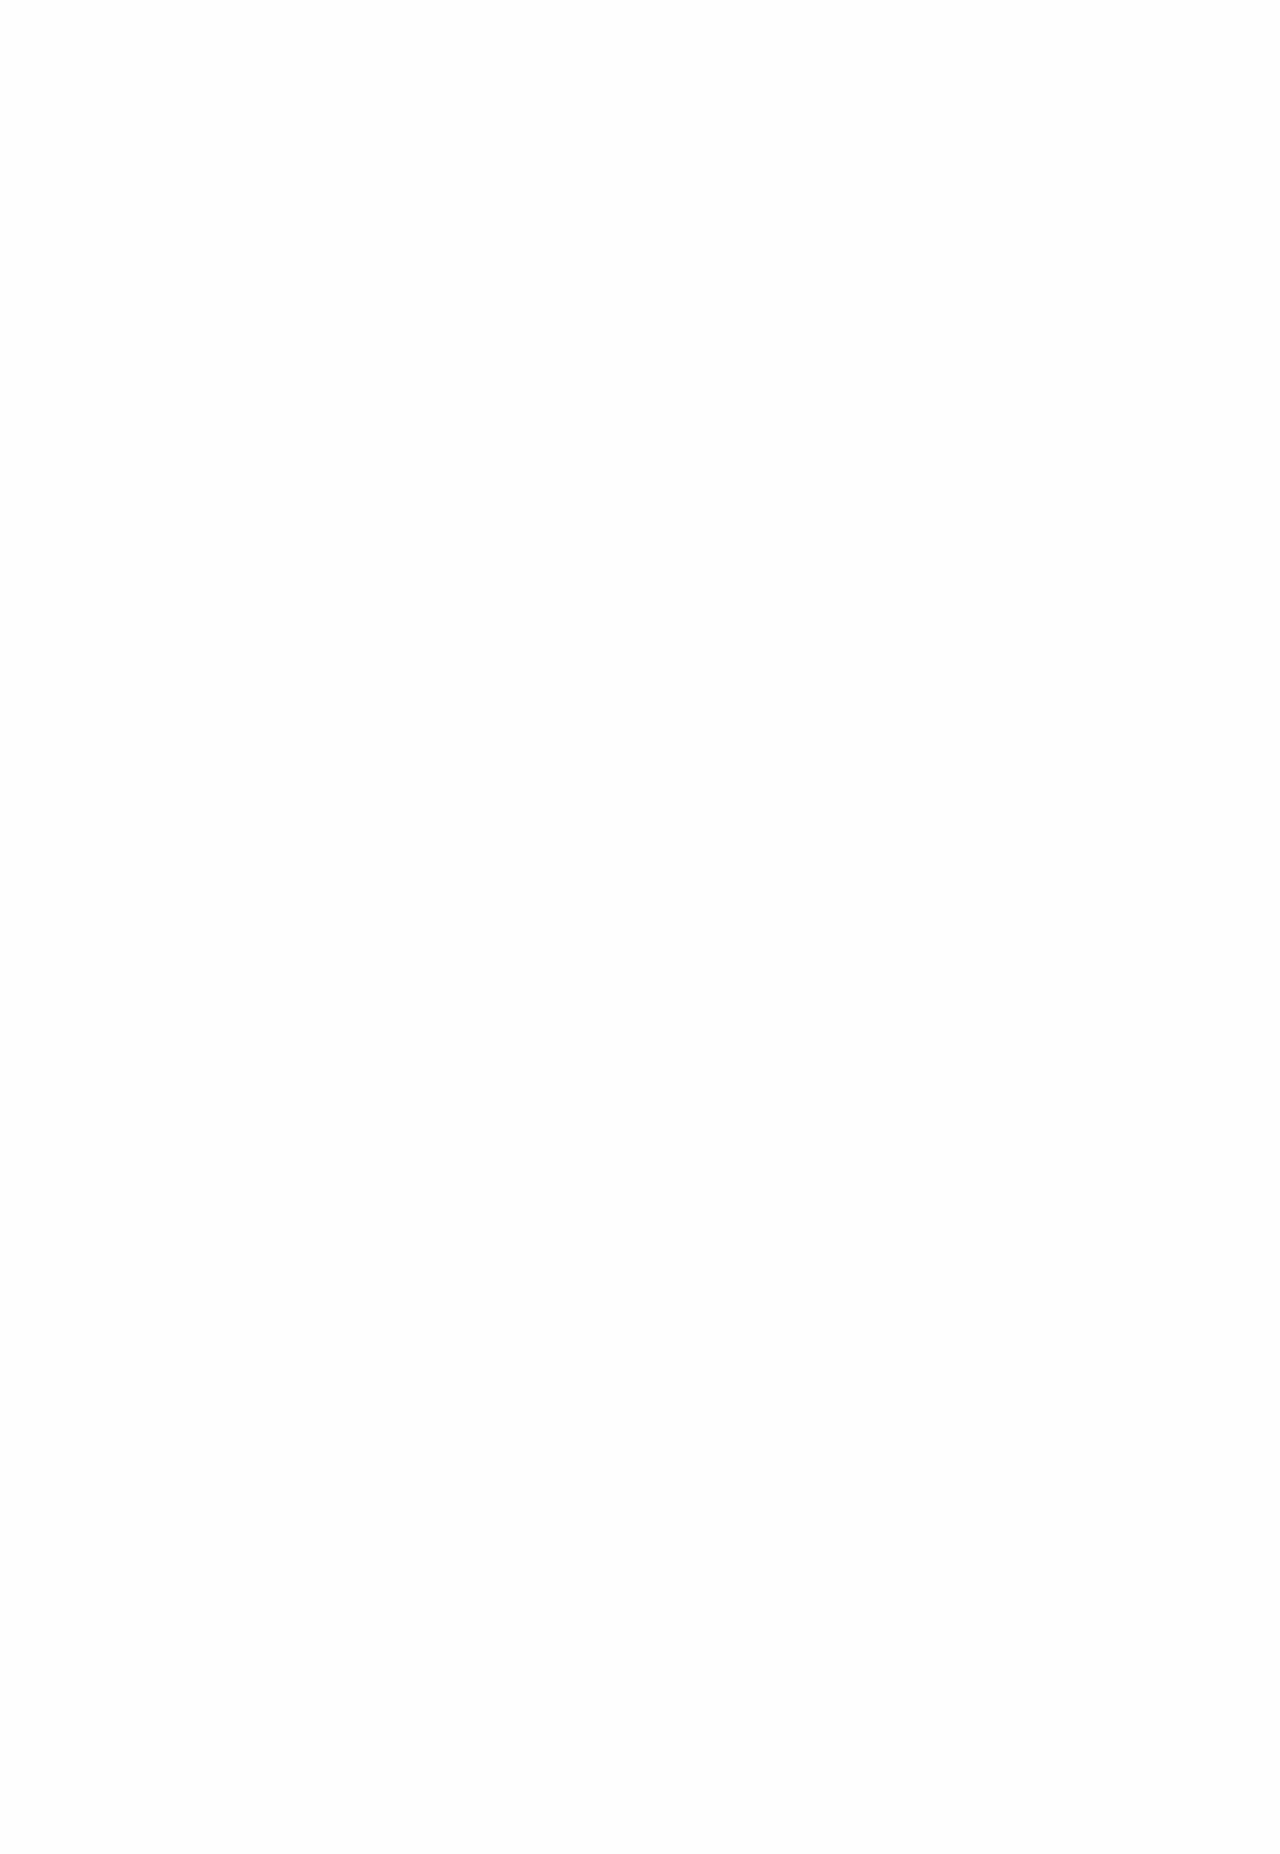 (C90) [Gokutsubushi (Misoiri)] Chiisai Lancer ga Bazett-san node Ookiku Naru | Little Lancer turns huge because of Bazett-san (Fate/hollow Ataraxia) [English] [EHCOVE] 1